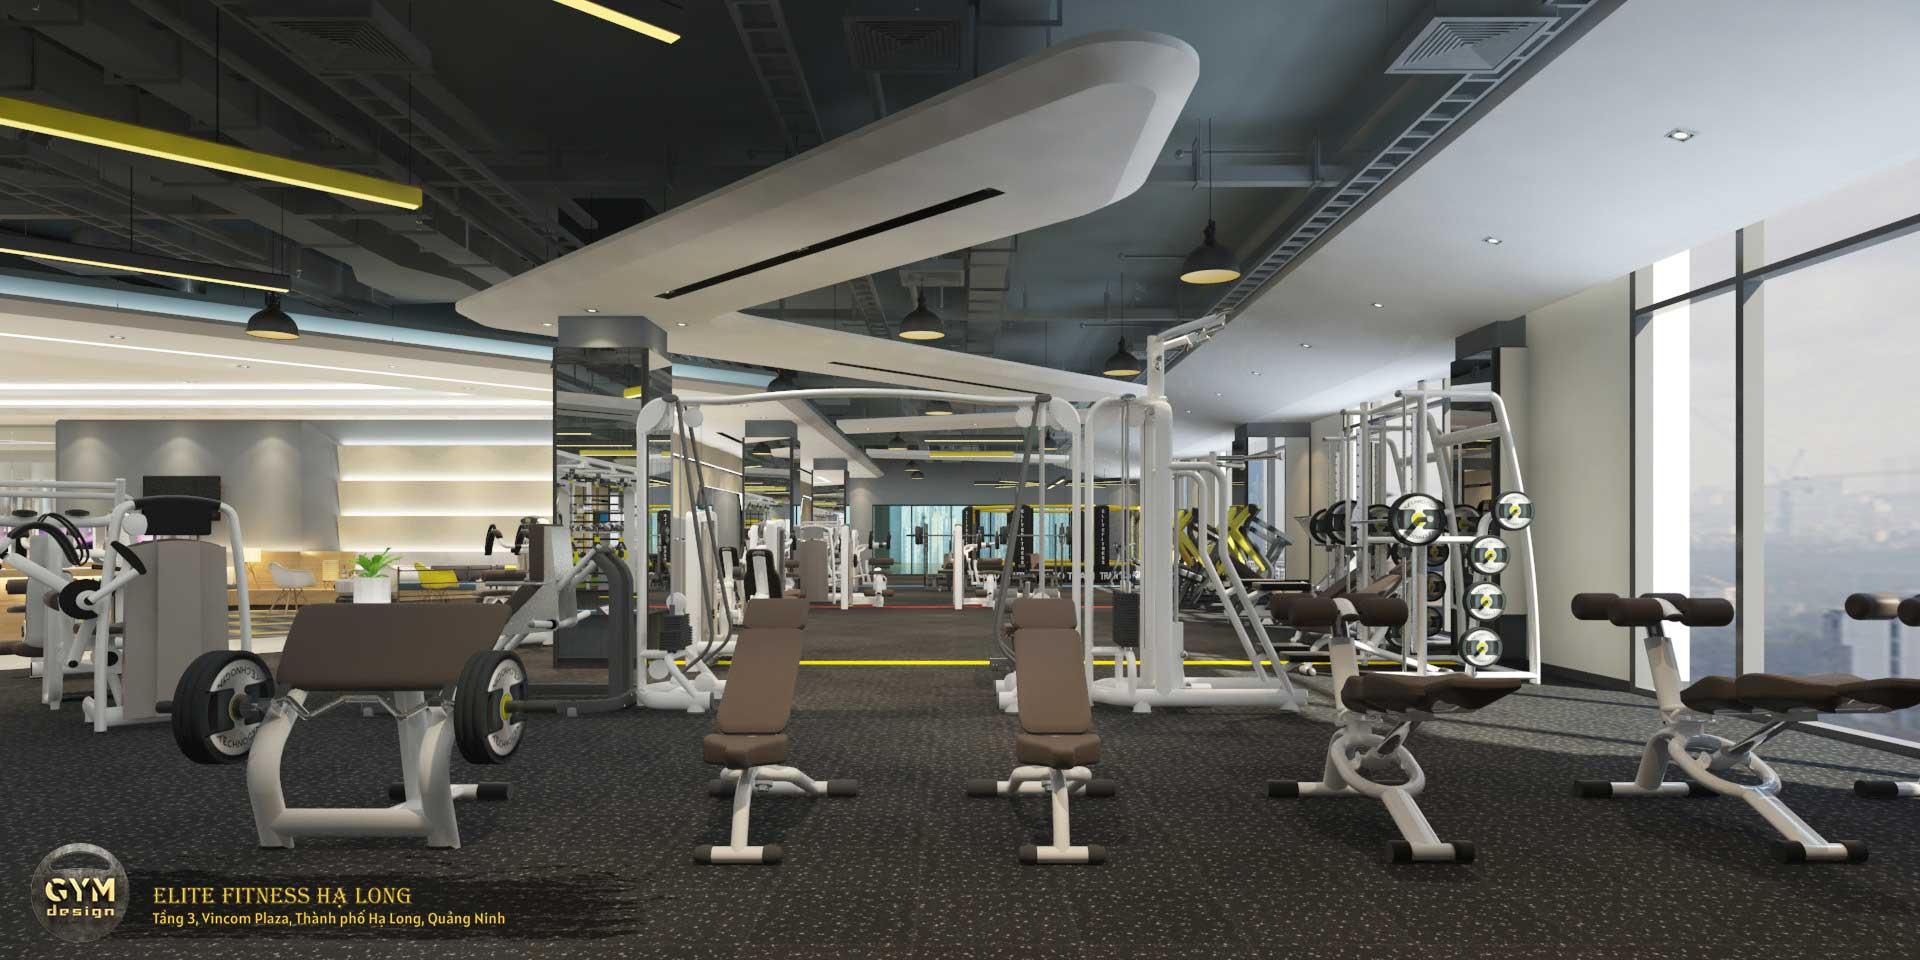 thiet-ke-phong-gym-elite-fitness-ha-long-14